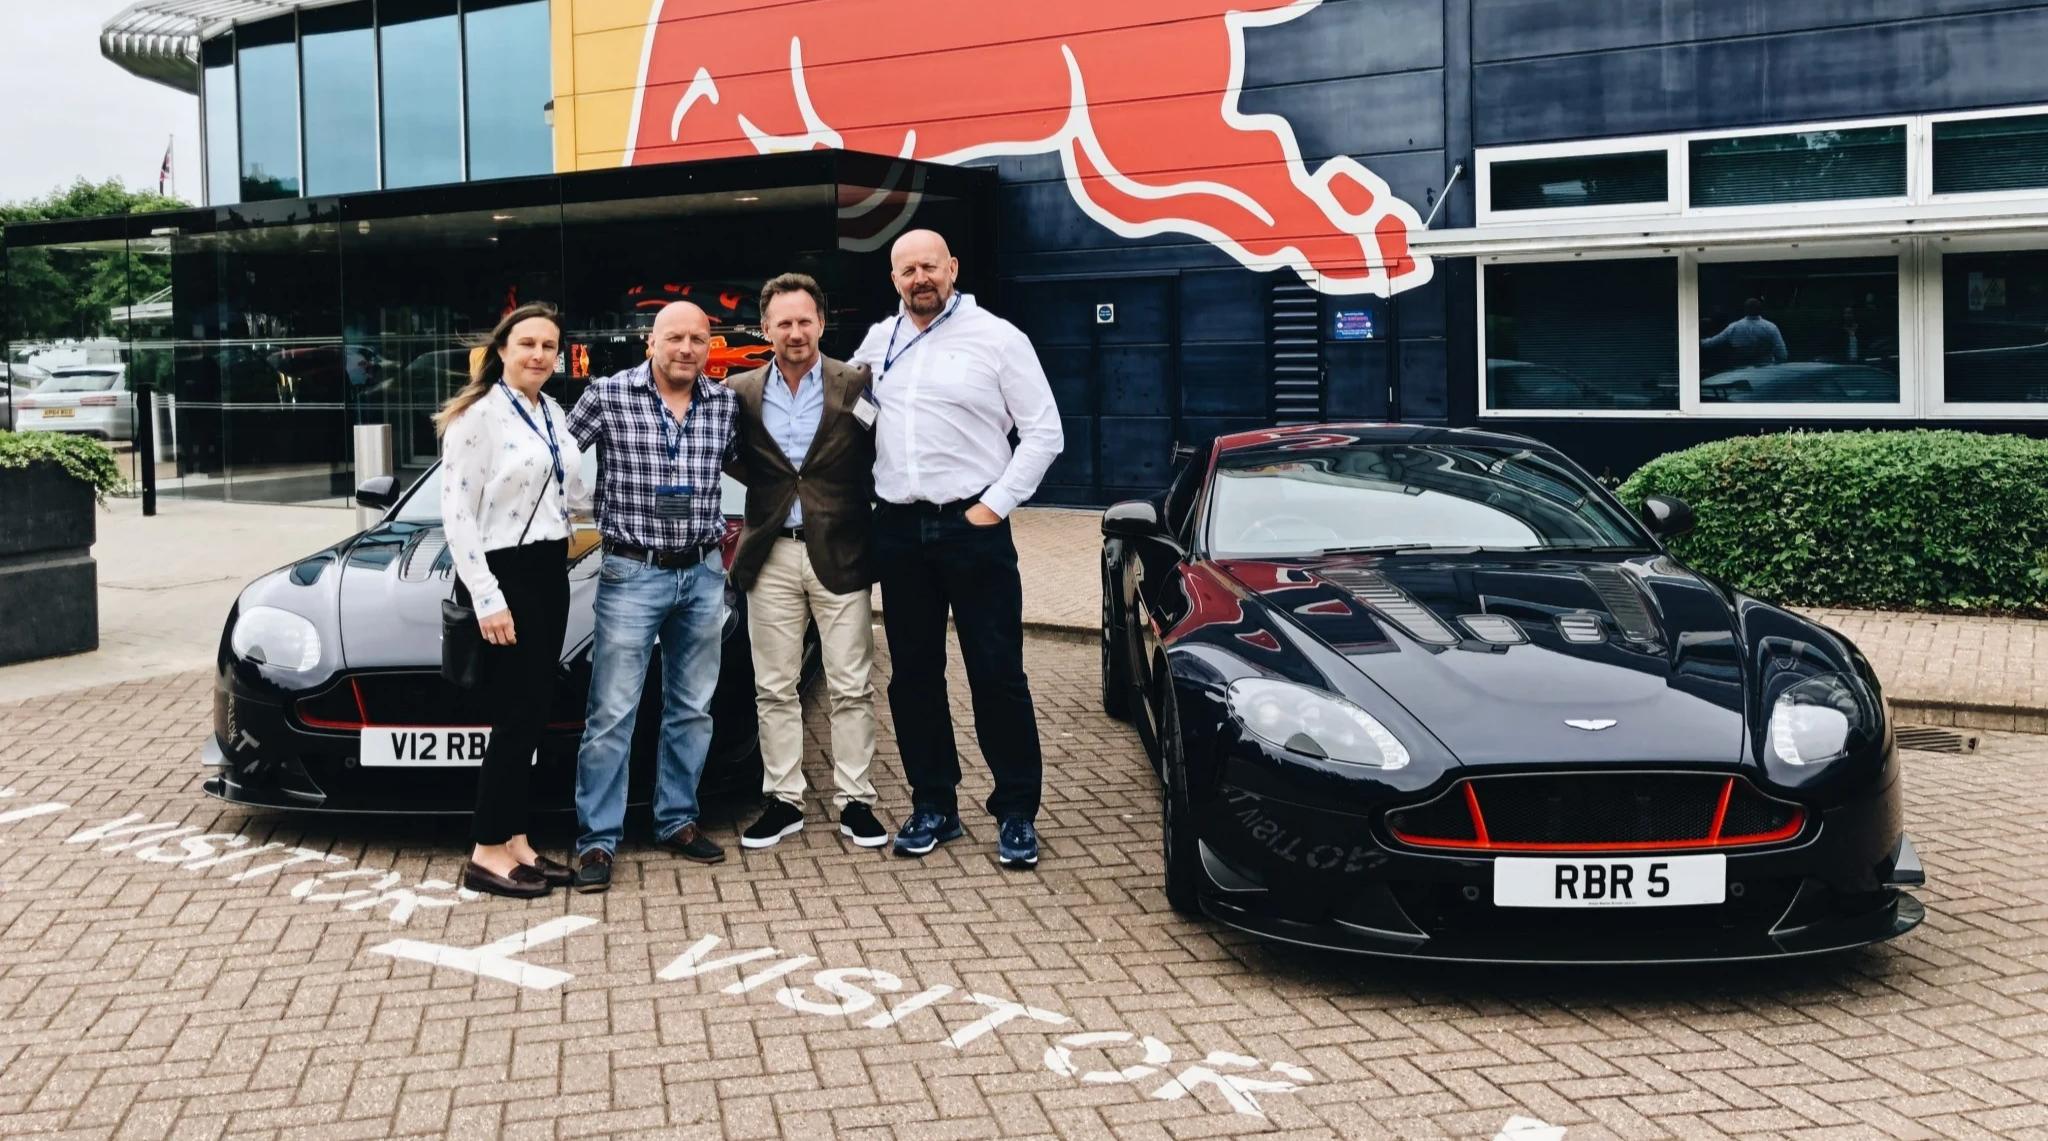 Aston Martin Red Bull Customers